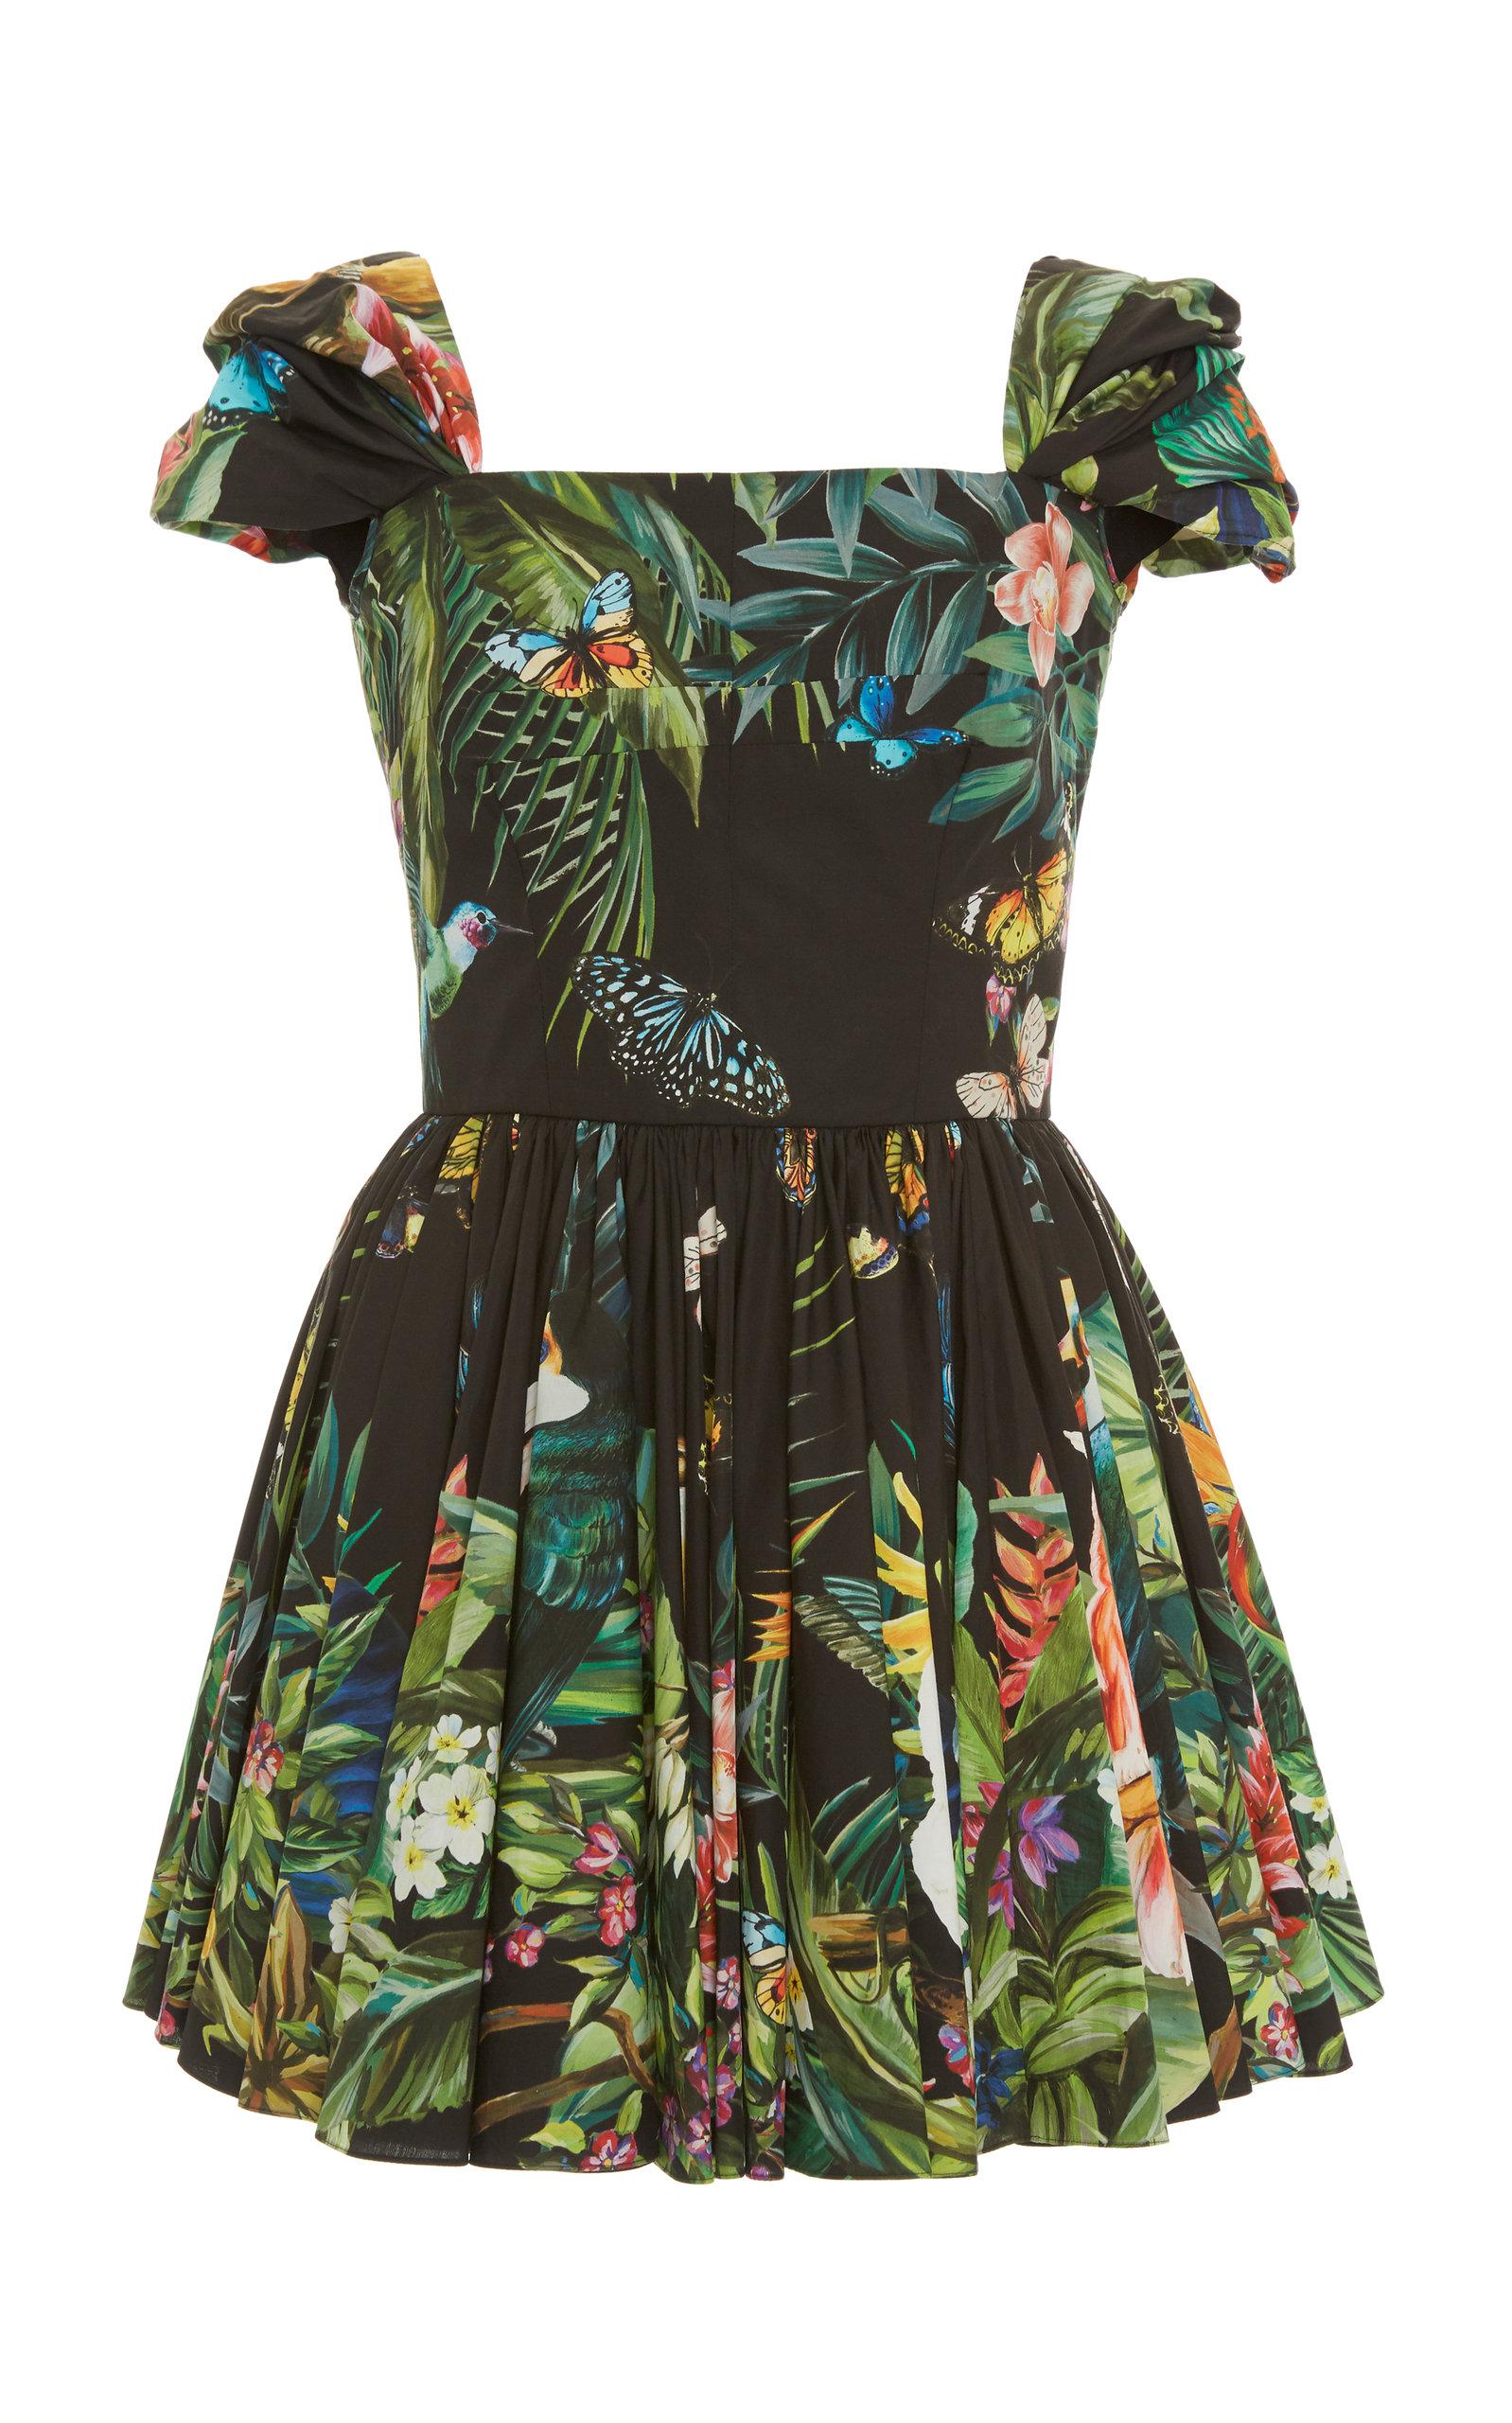 Buy Dolce & Gabbana Printed Cotton-Poplin Mini Dress online, shop Dolce & Gabbana at the best price